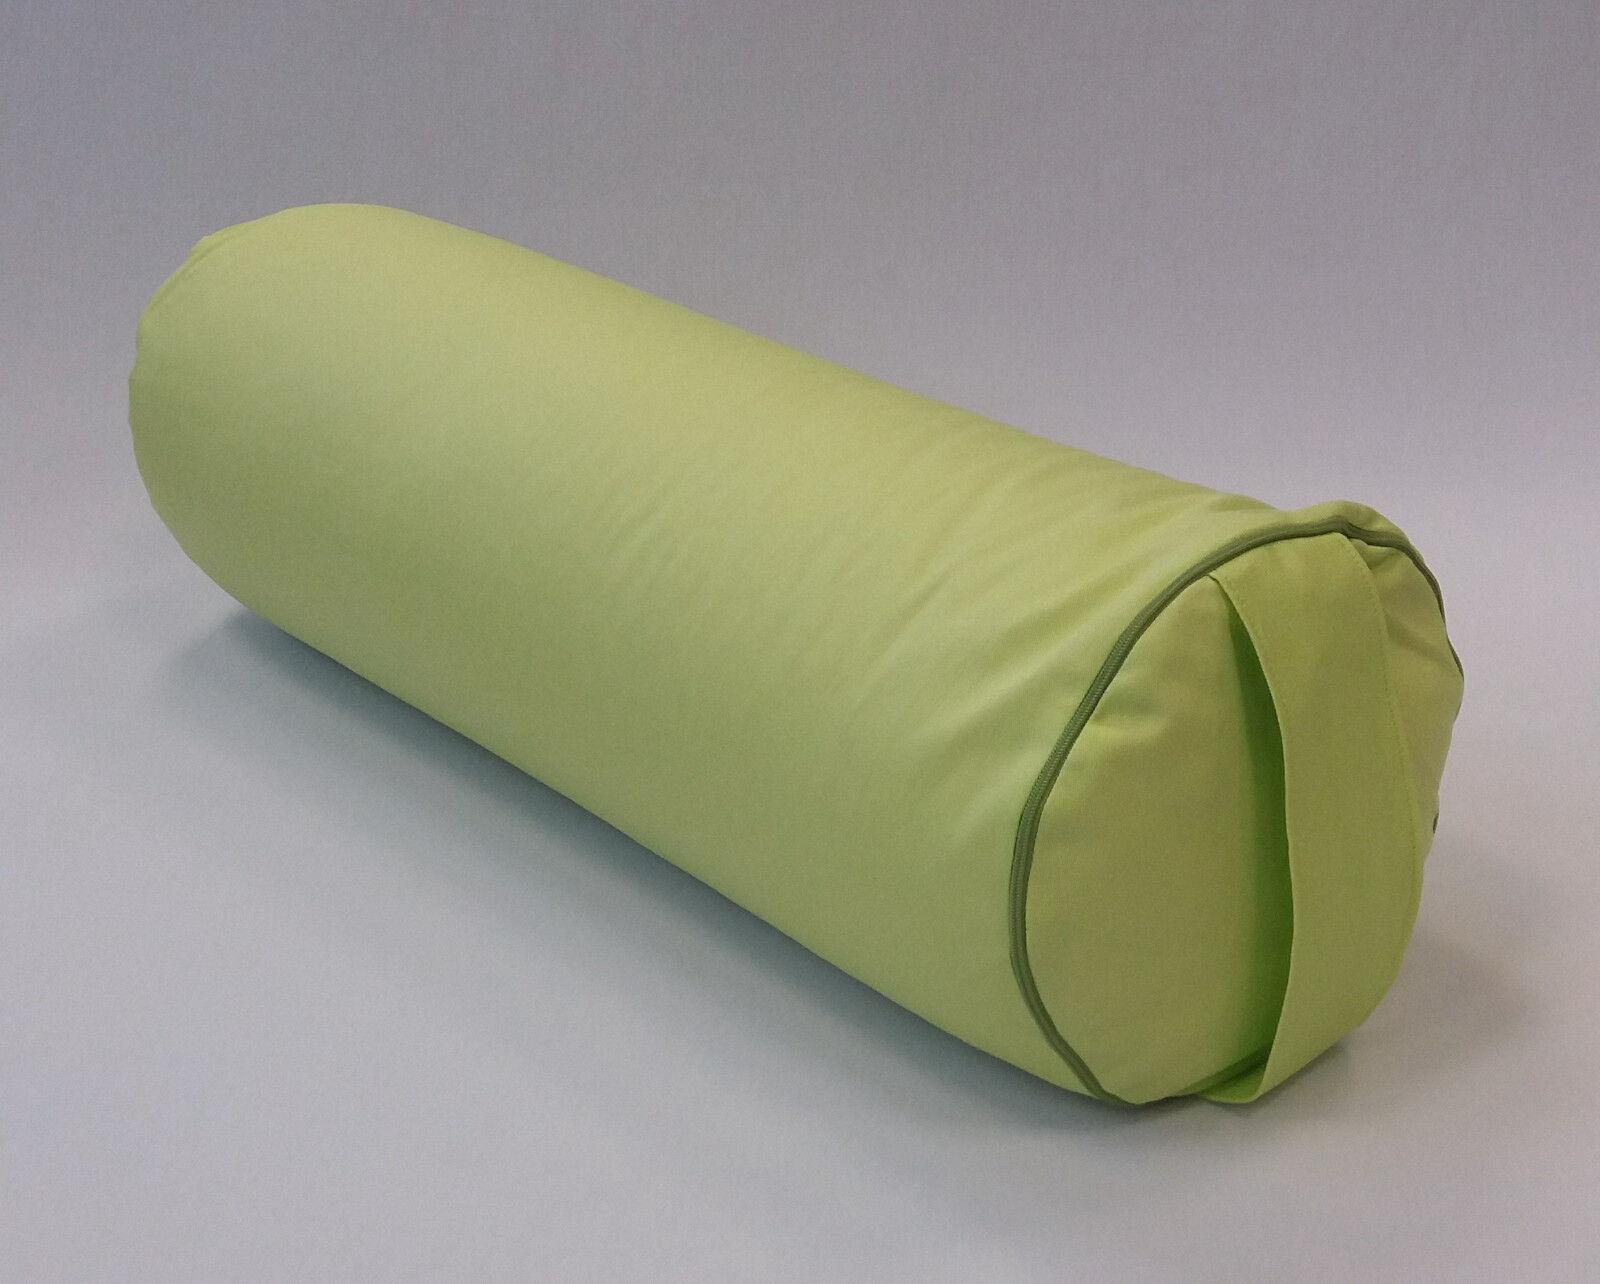 Yogarolle/Pilates e Yoga Bolster/ Yoga Ø 22 Cm Cm 22 x 65cm L d2194f